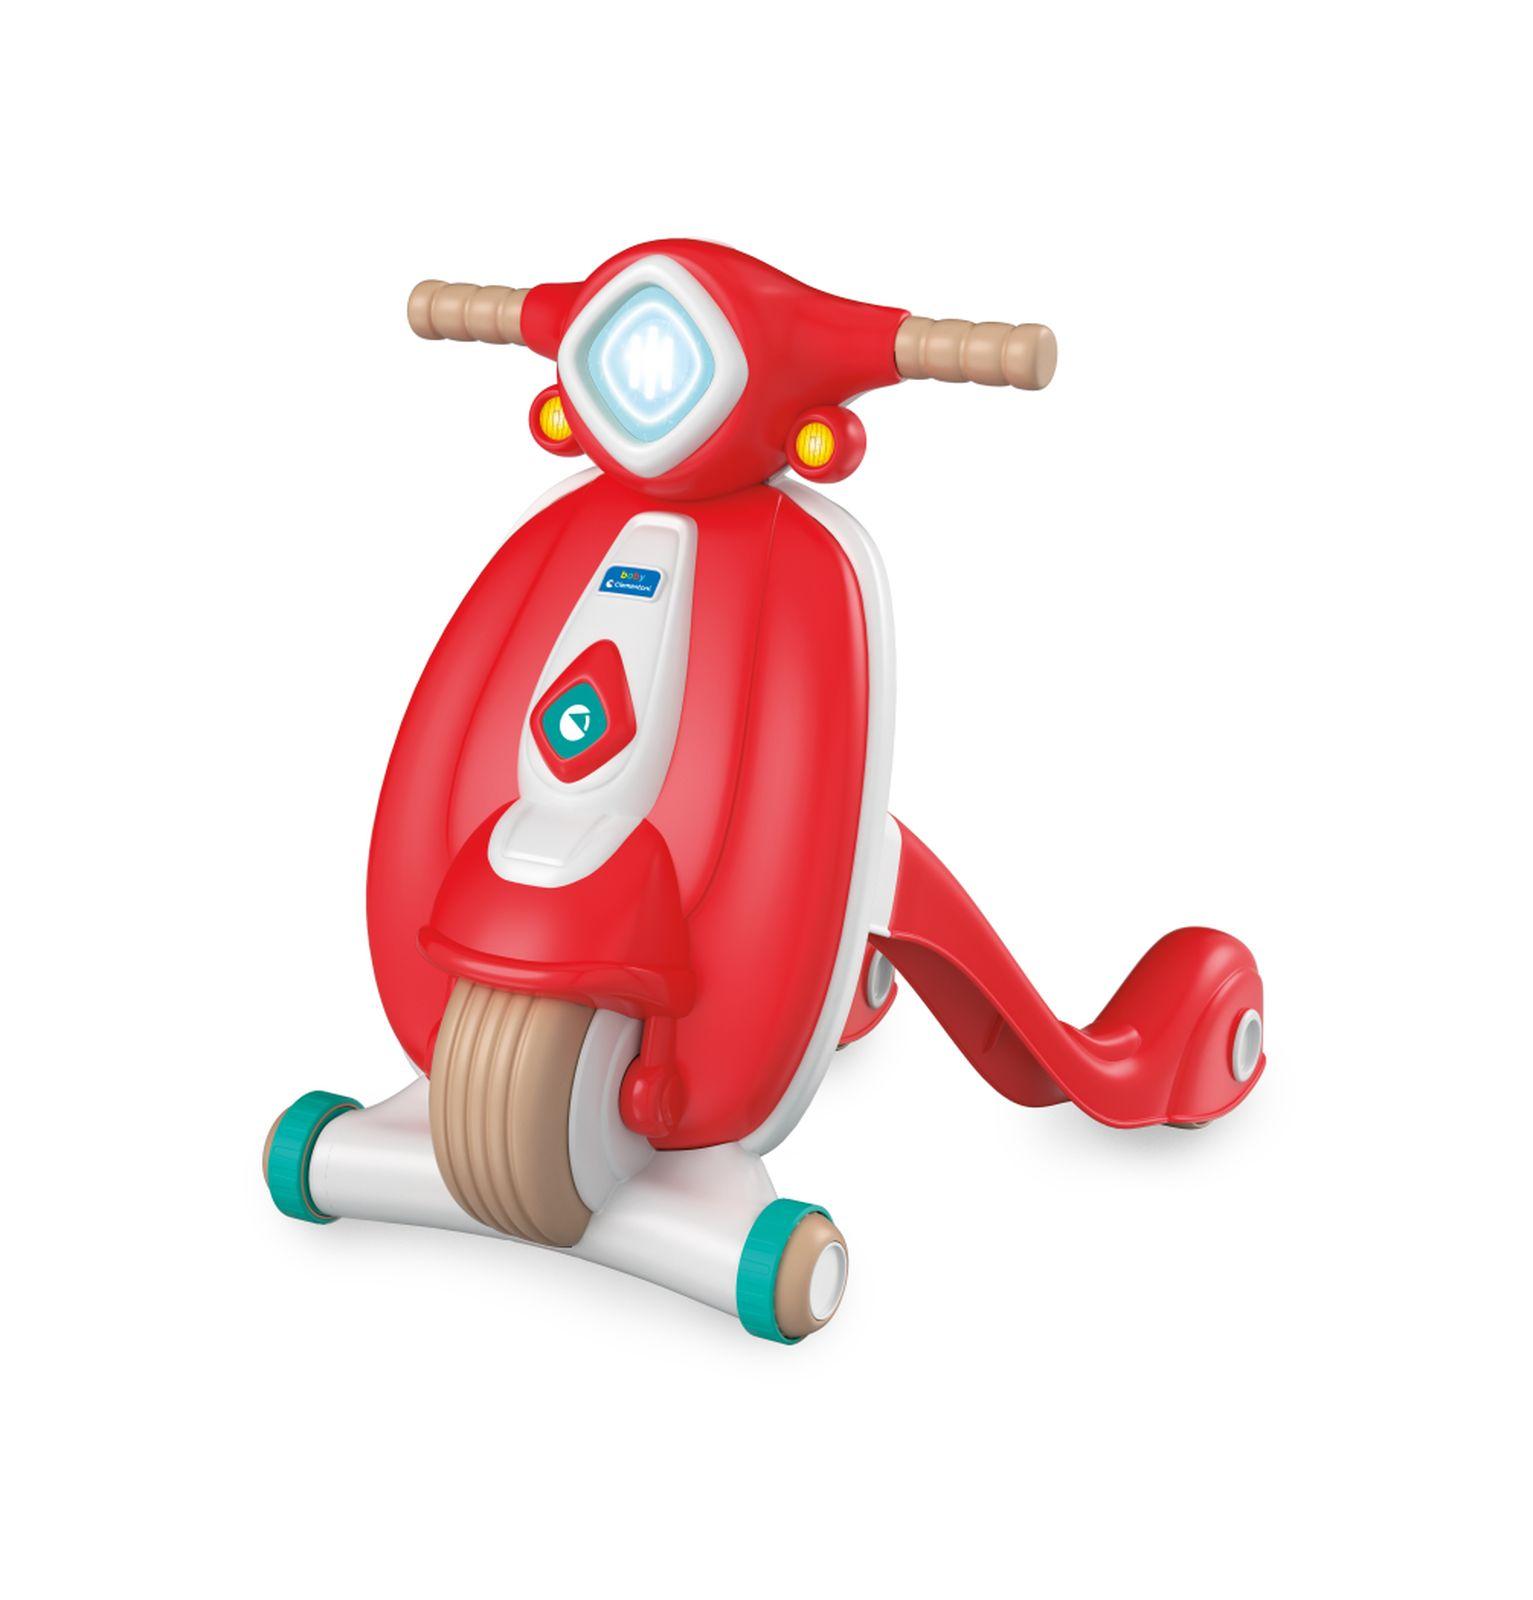 Clementoni - 17403 - il mio primo scooter - BABY CLEMENTONI